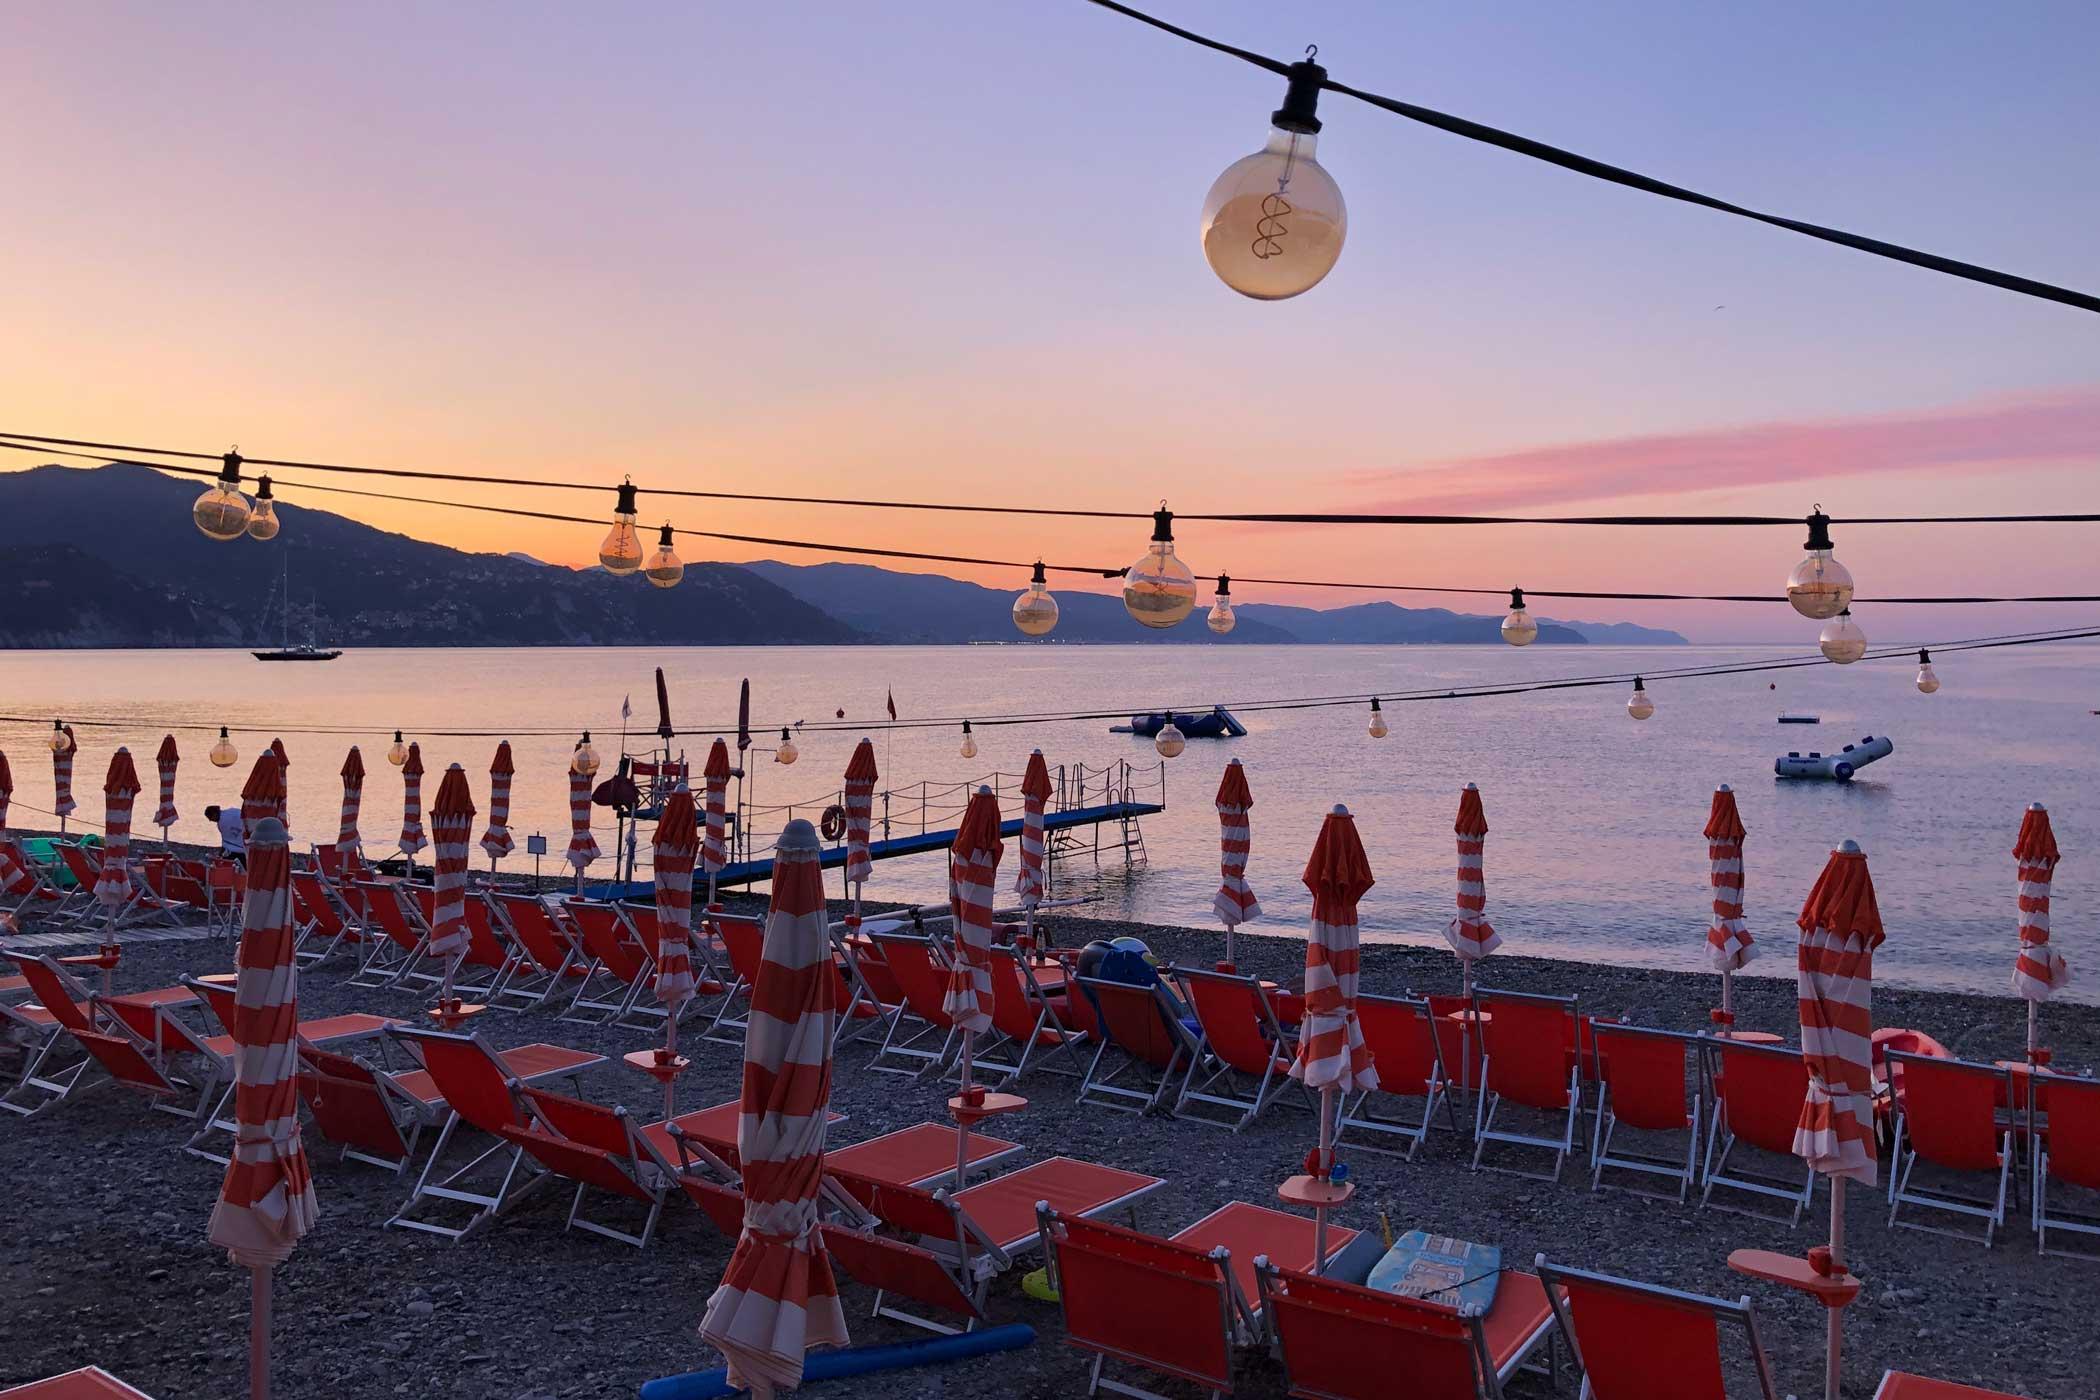 Bagni Sirena Santa Margherita Ligure 2019 - tramonto